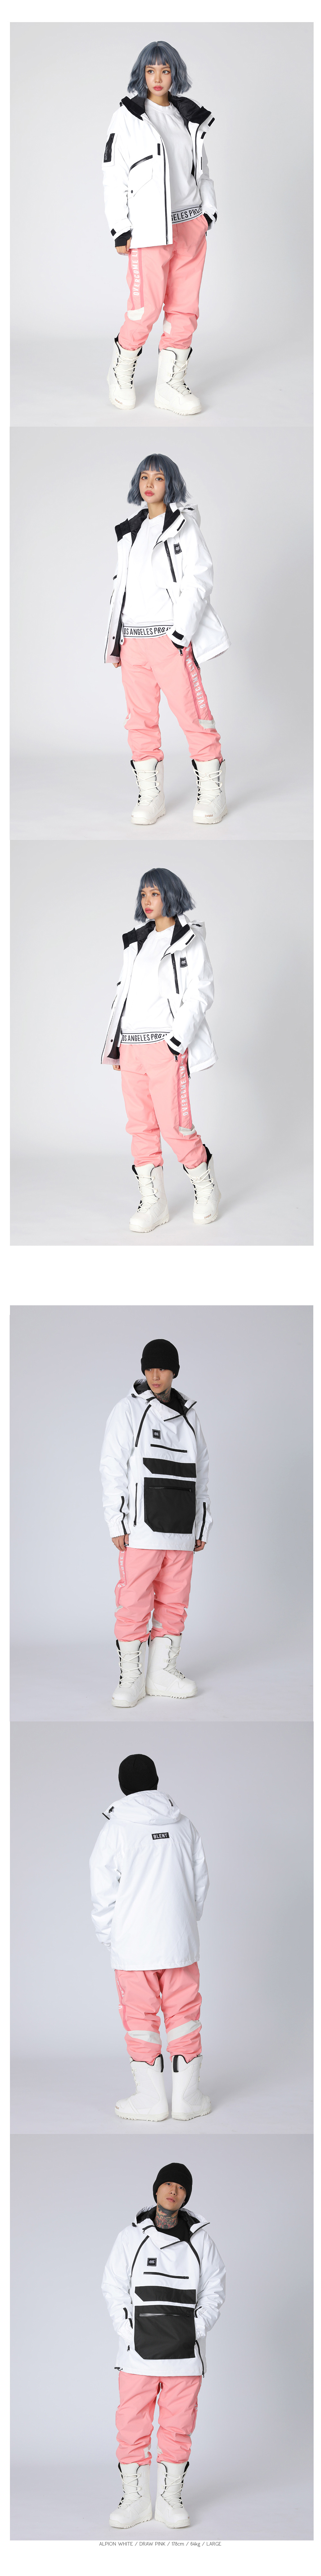 pant_jogger_pink_d2.jpg